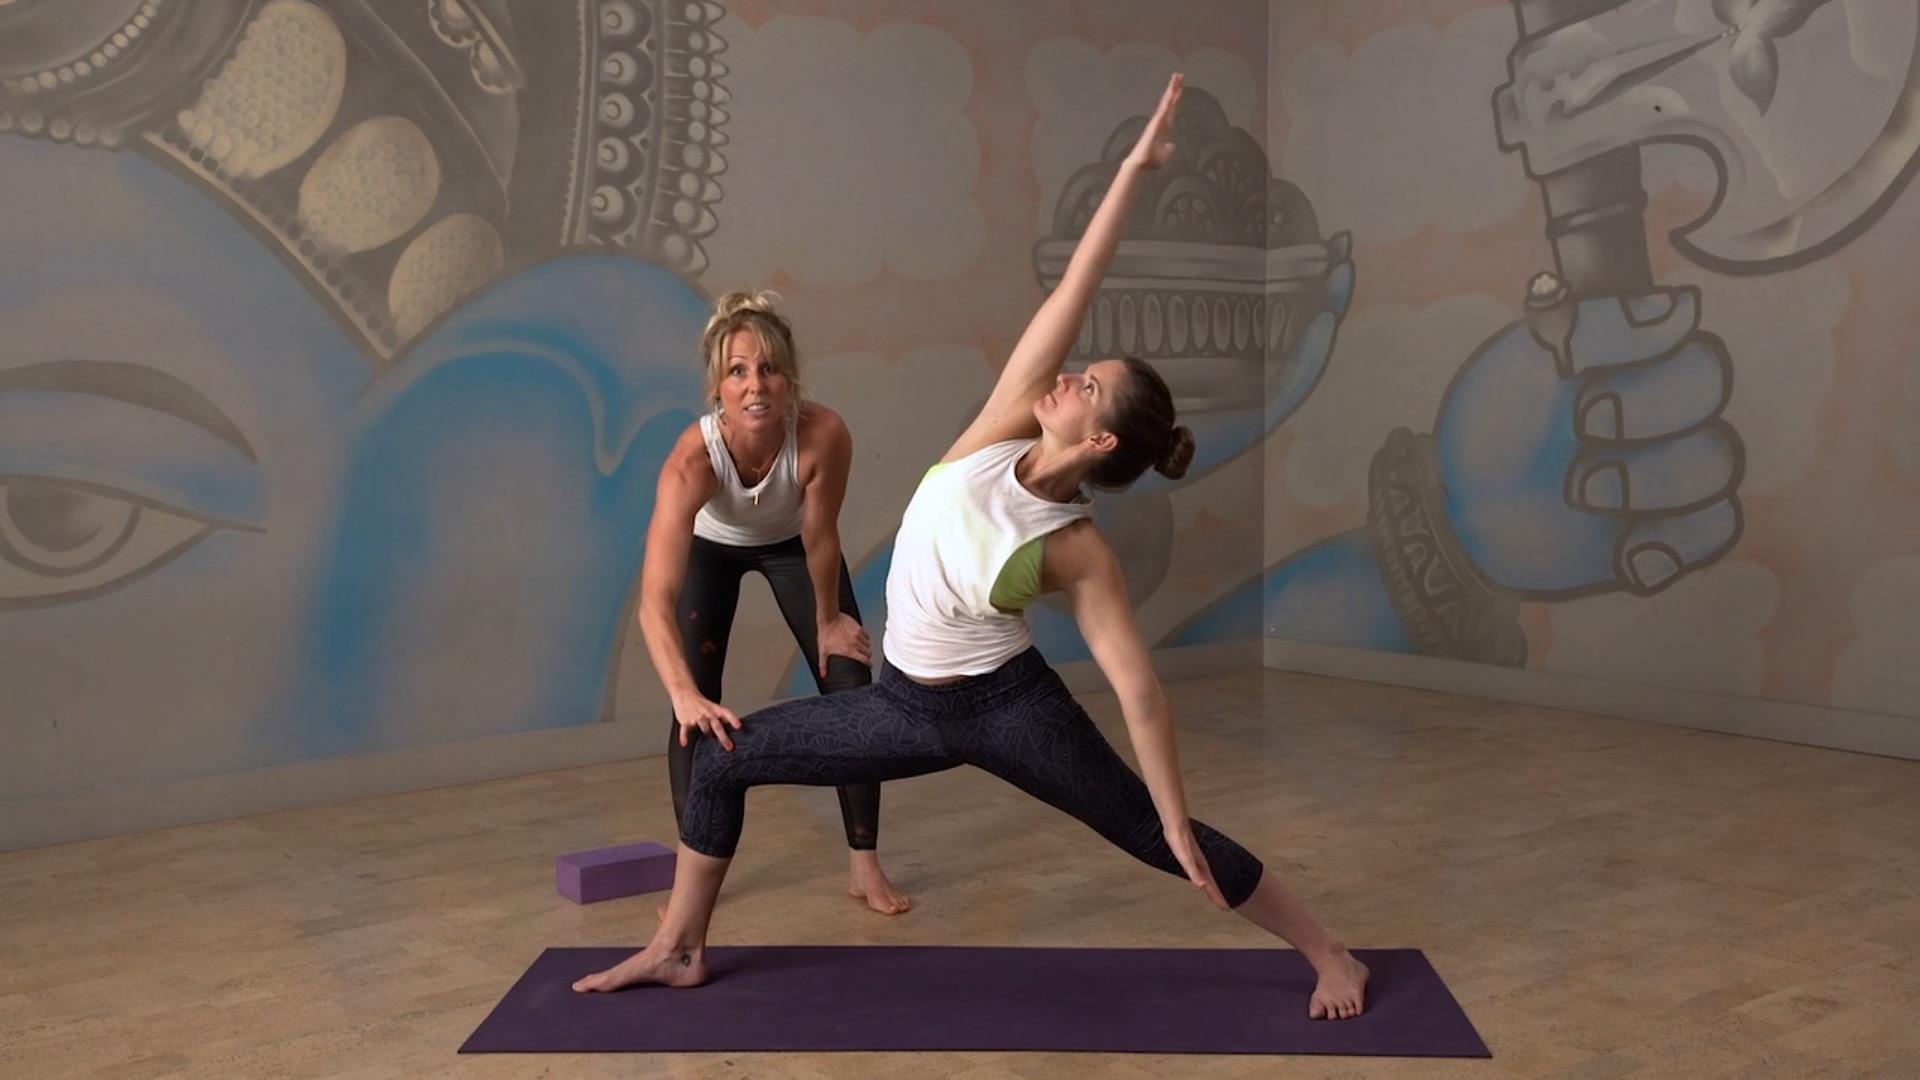 flex them hips tobie morris yogaholics power living australia yoga online yoga